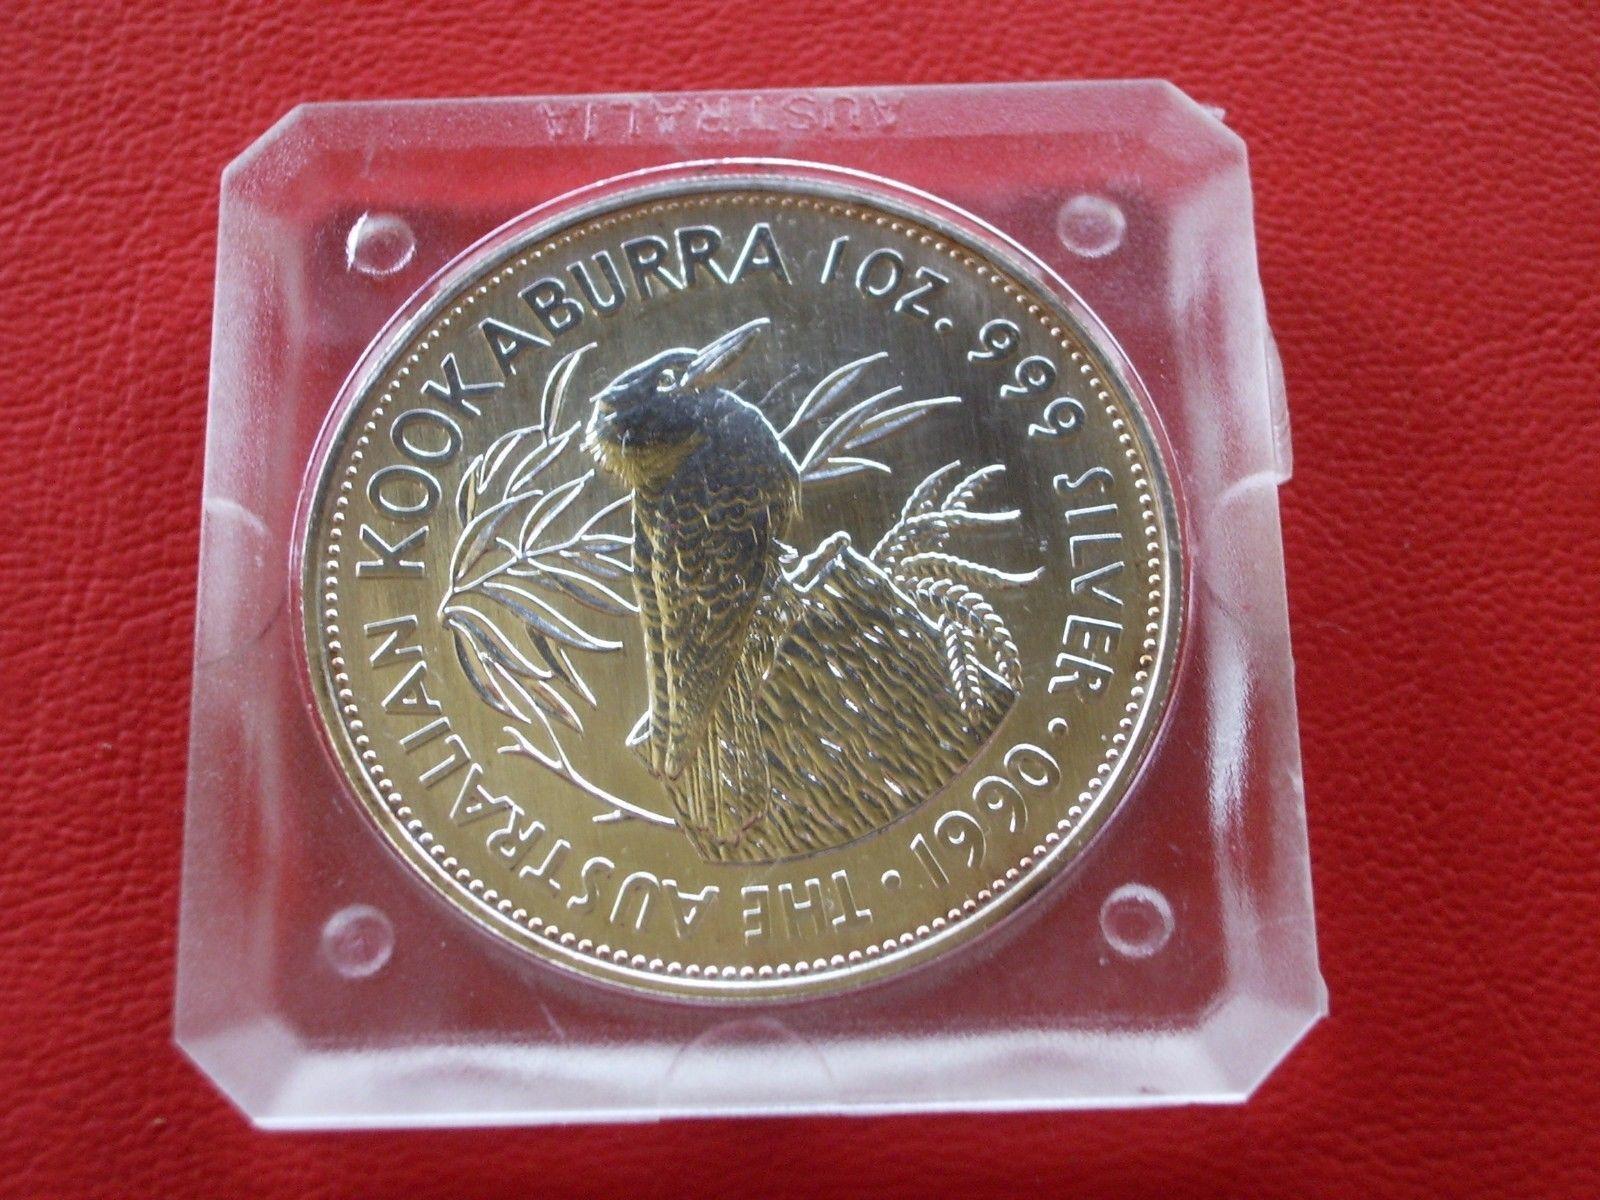 1 oz AG Australien Kookaburra 1990 in orig. Kapsel!sparen25.com , sparen25.de , sparen25.info